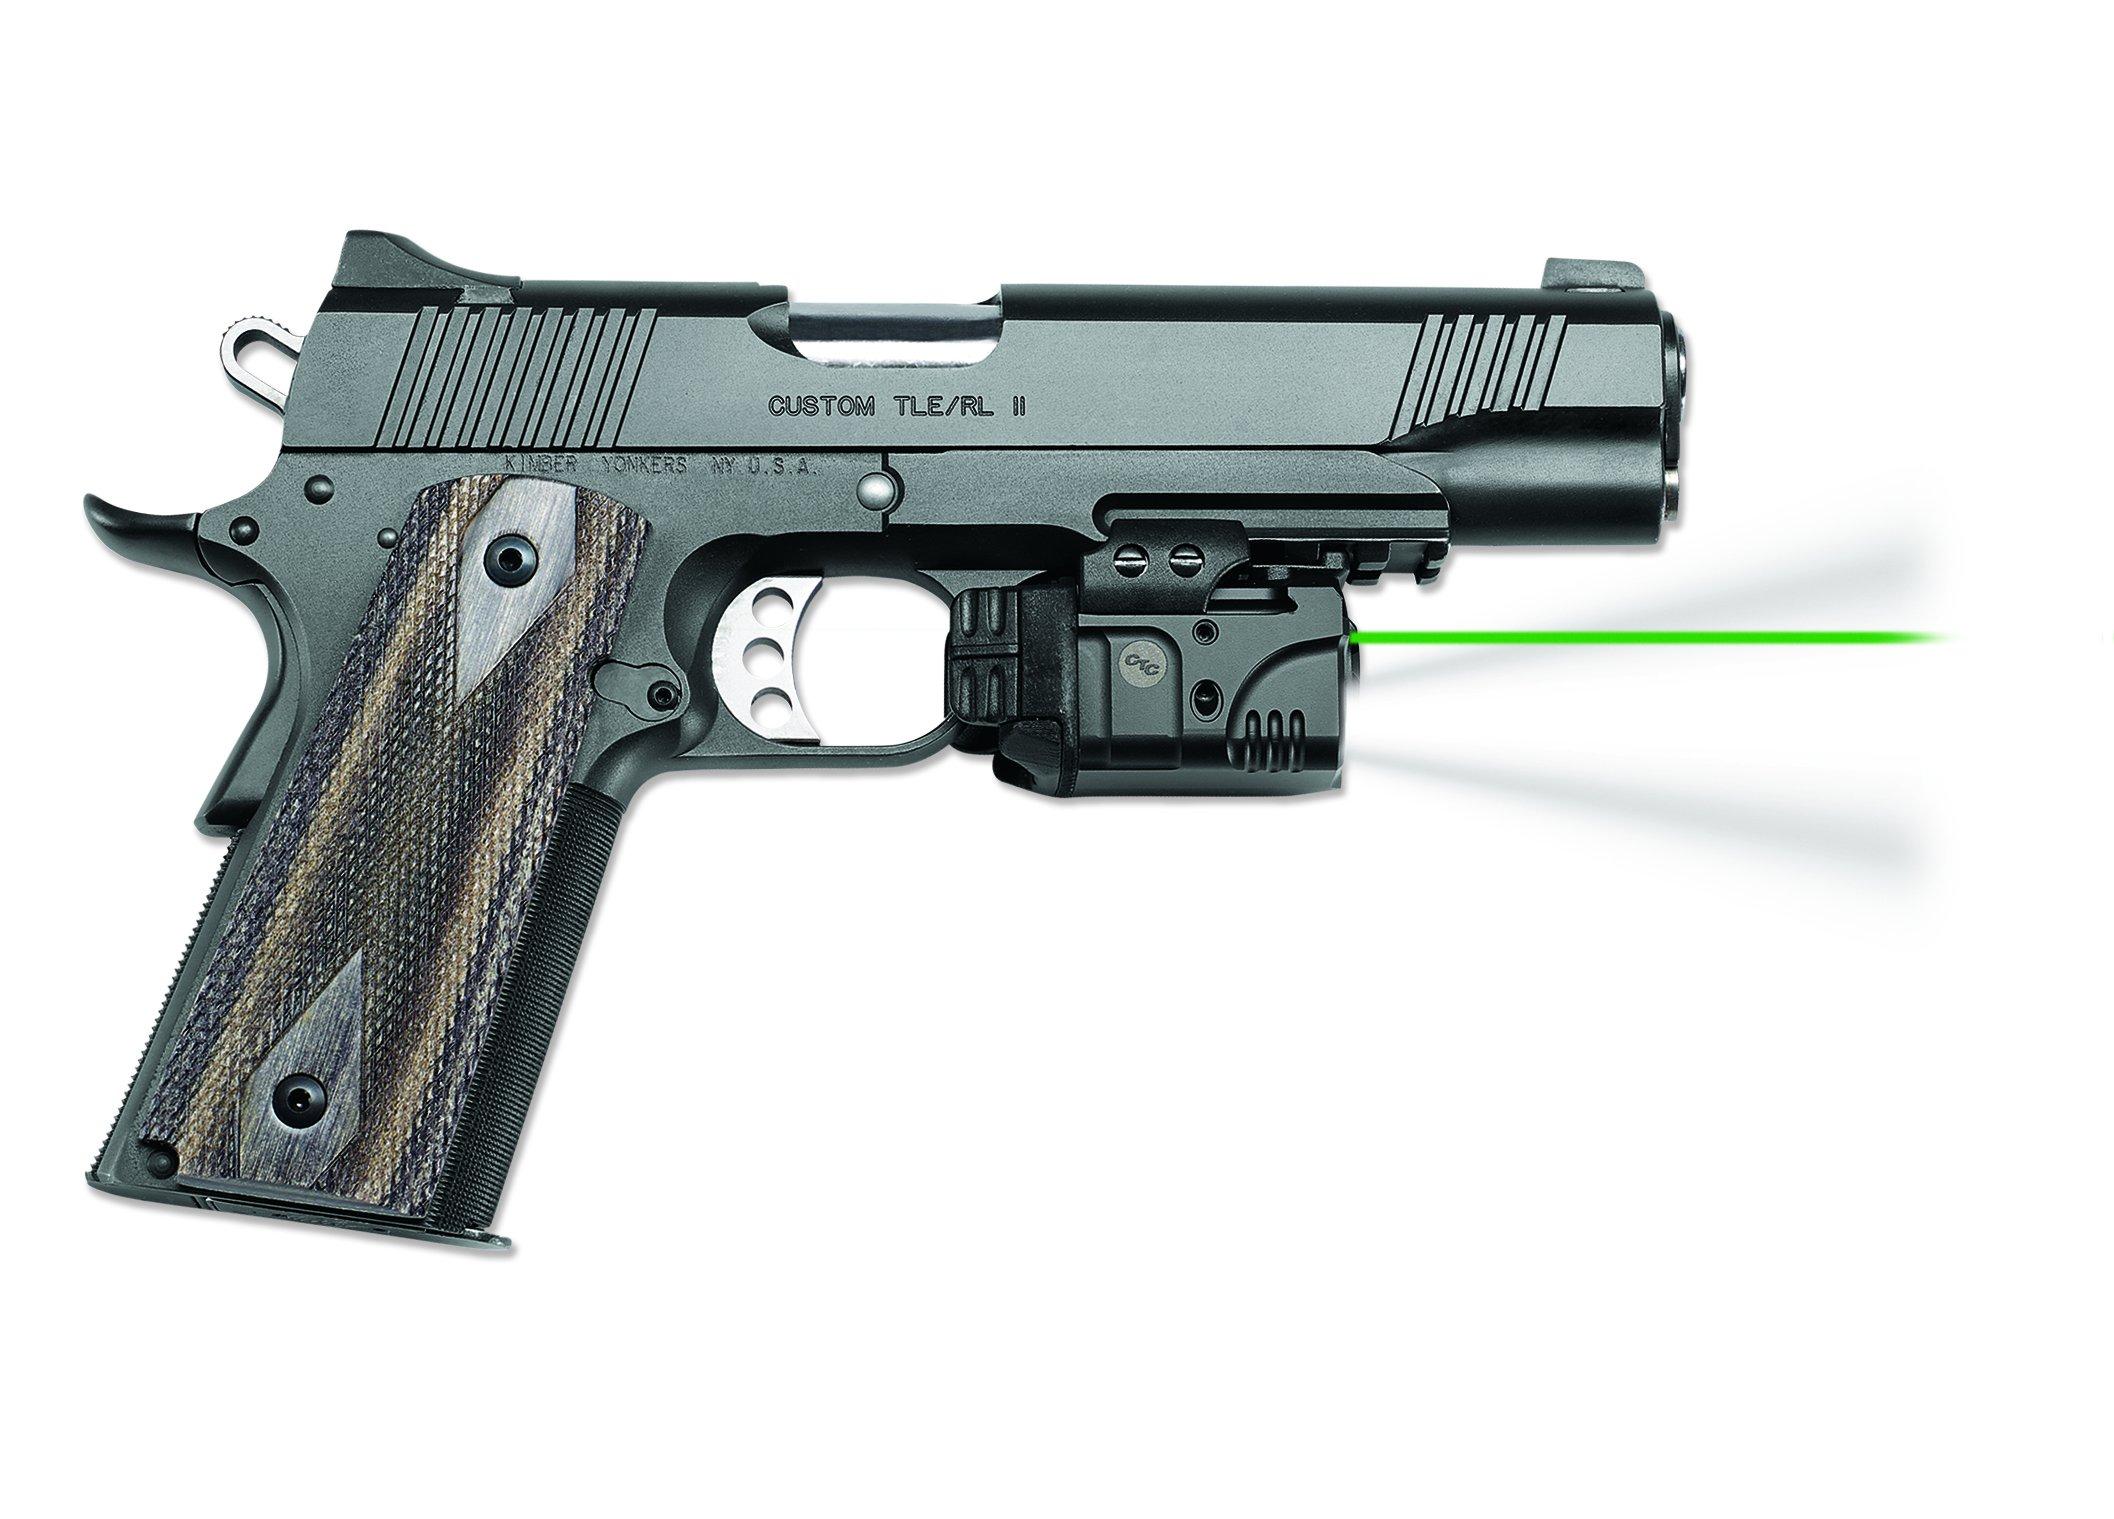 Crimson Trace CMR-204 Rail Master Pro Universal Green Laser & Tactical Light, Green Laser Sight by Crimson Trace